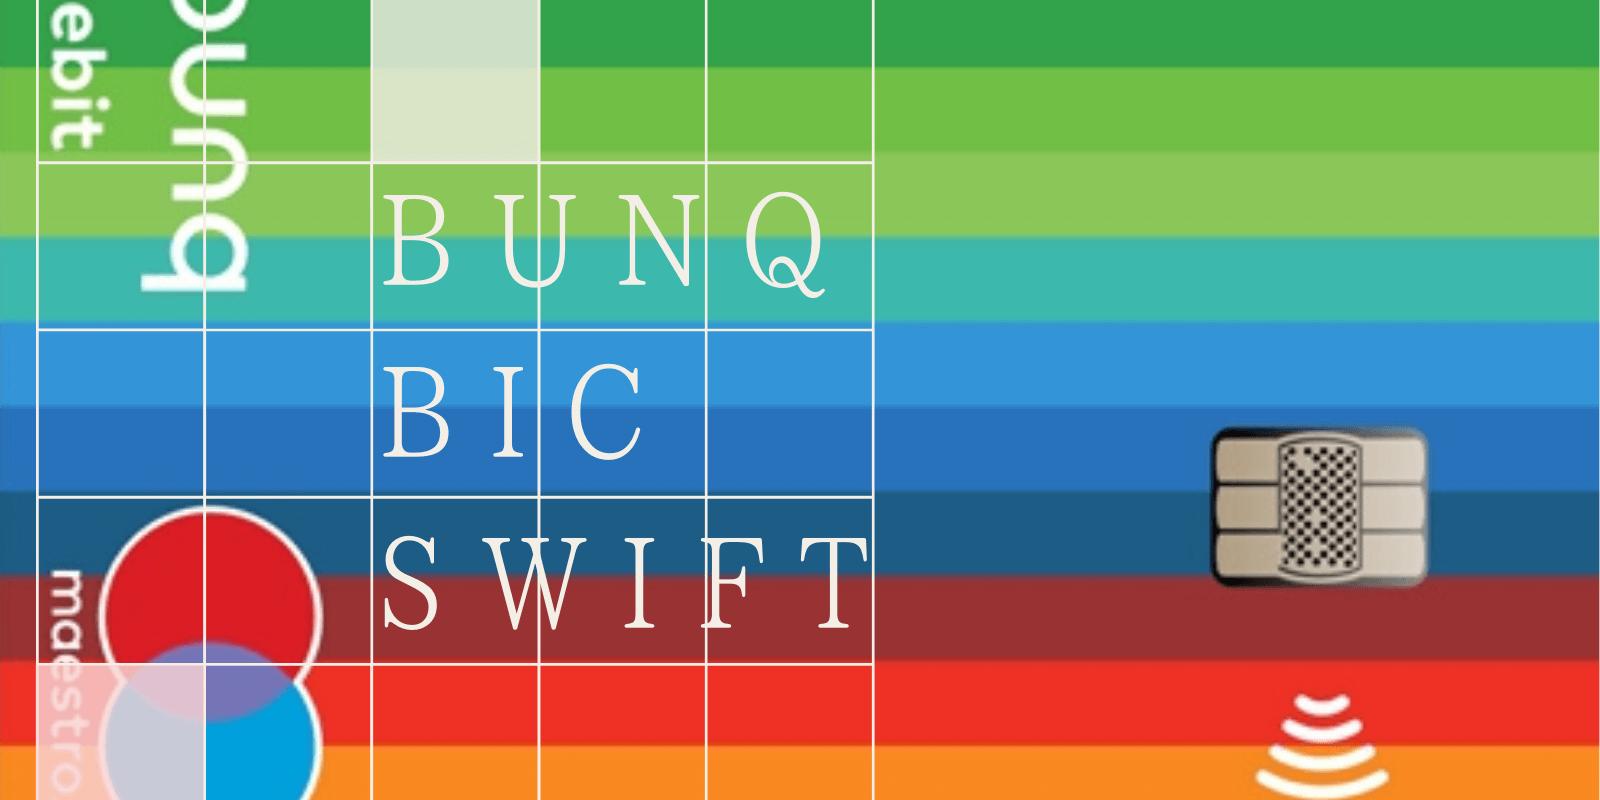 Bunq Bic SWFT